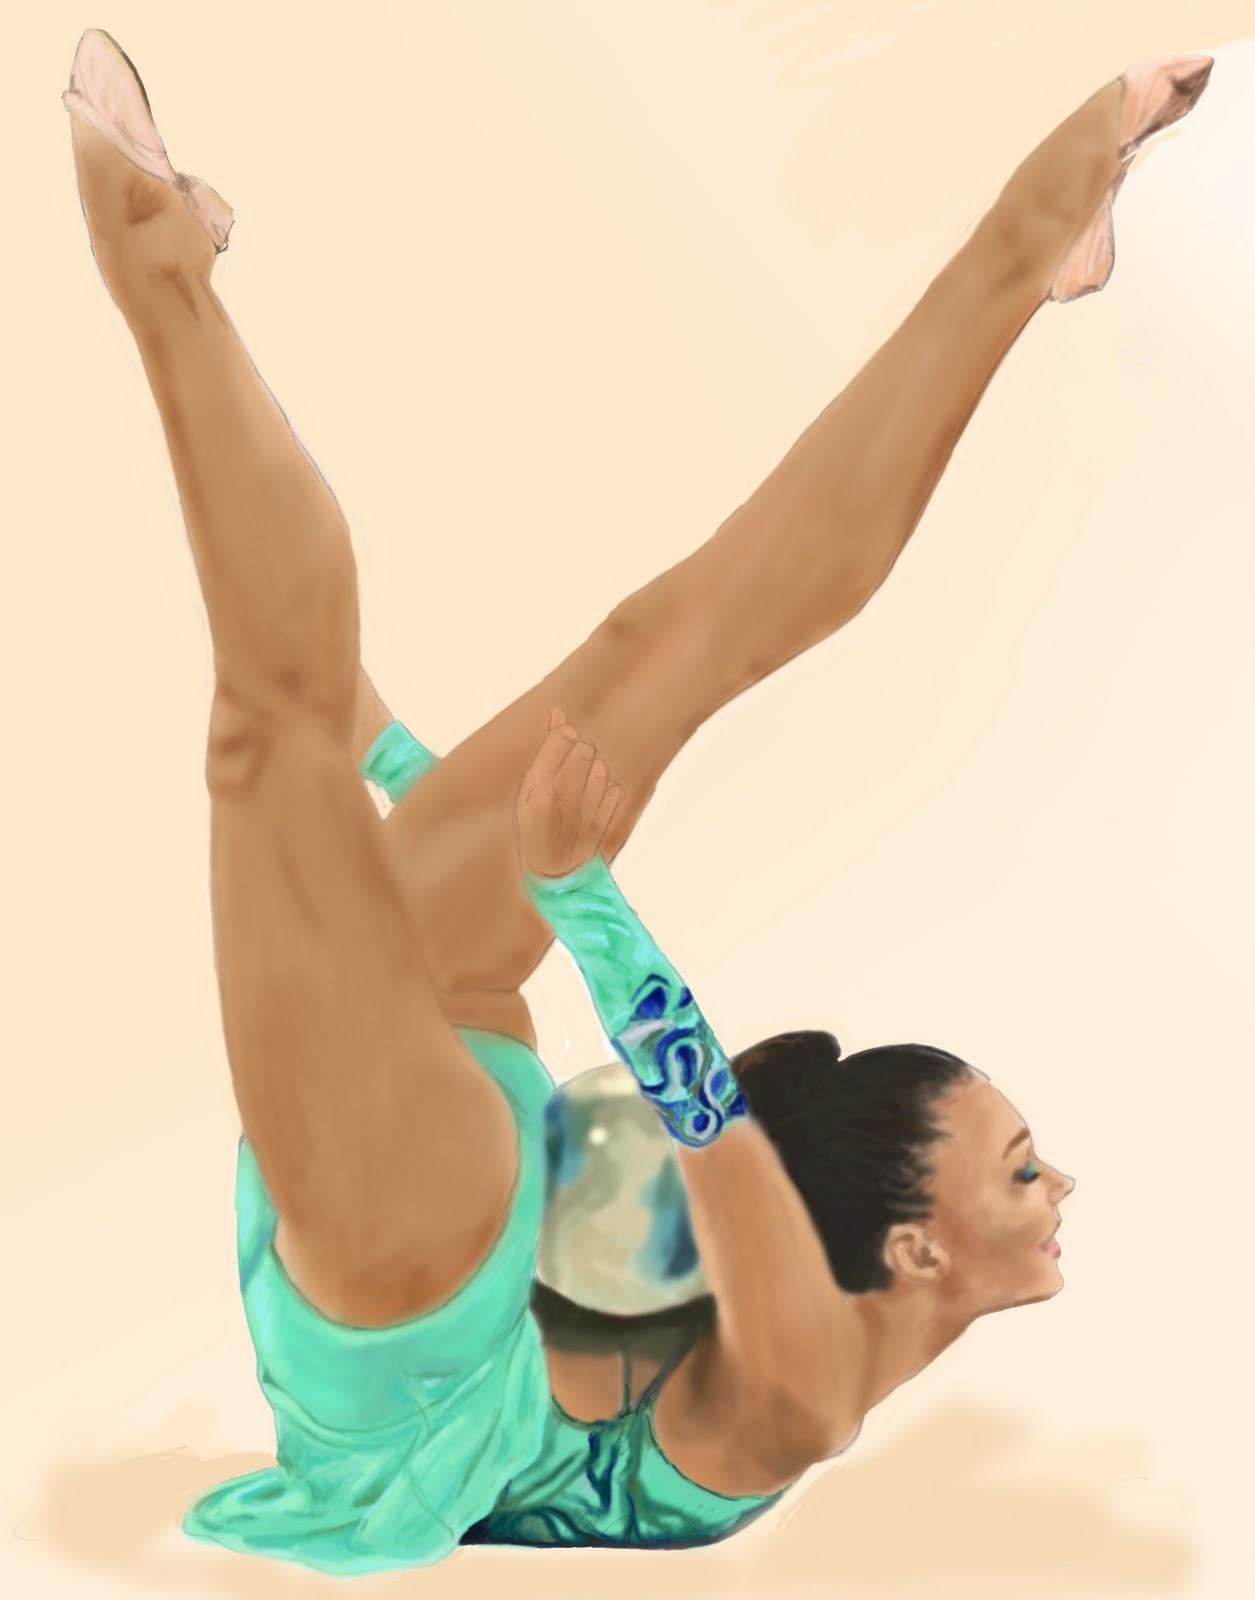 Голые женщины гимнастика 16